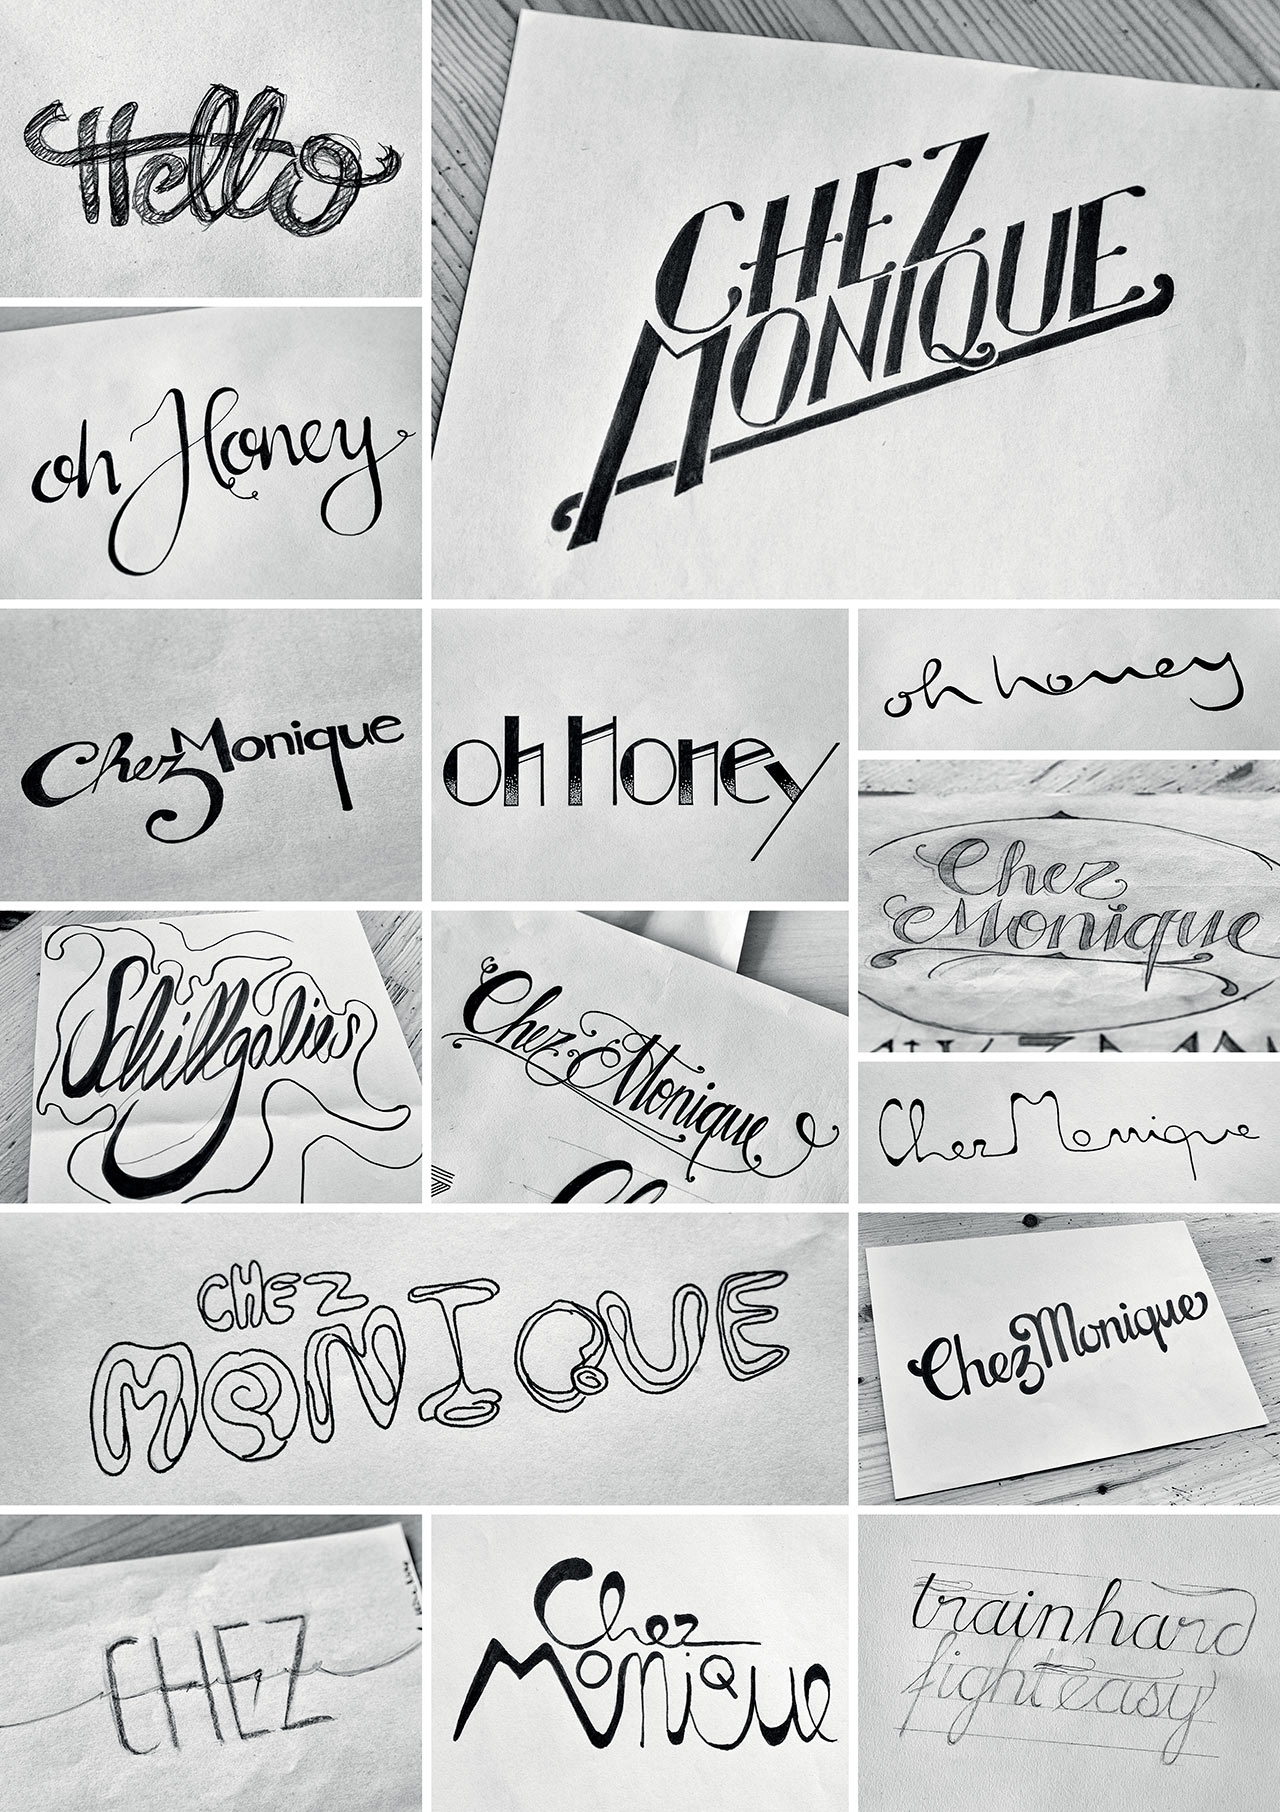 Typografie-Unterricht | B U T S C H I N S K Y – Ein Typografie-Blog ...